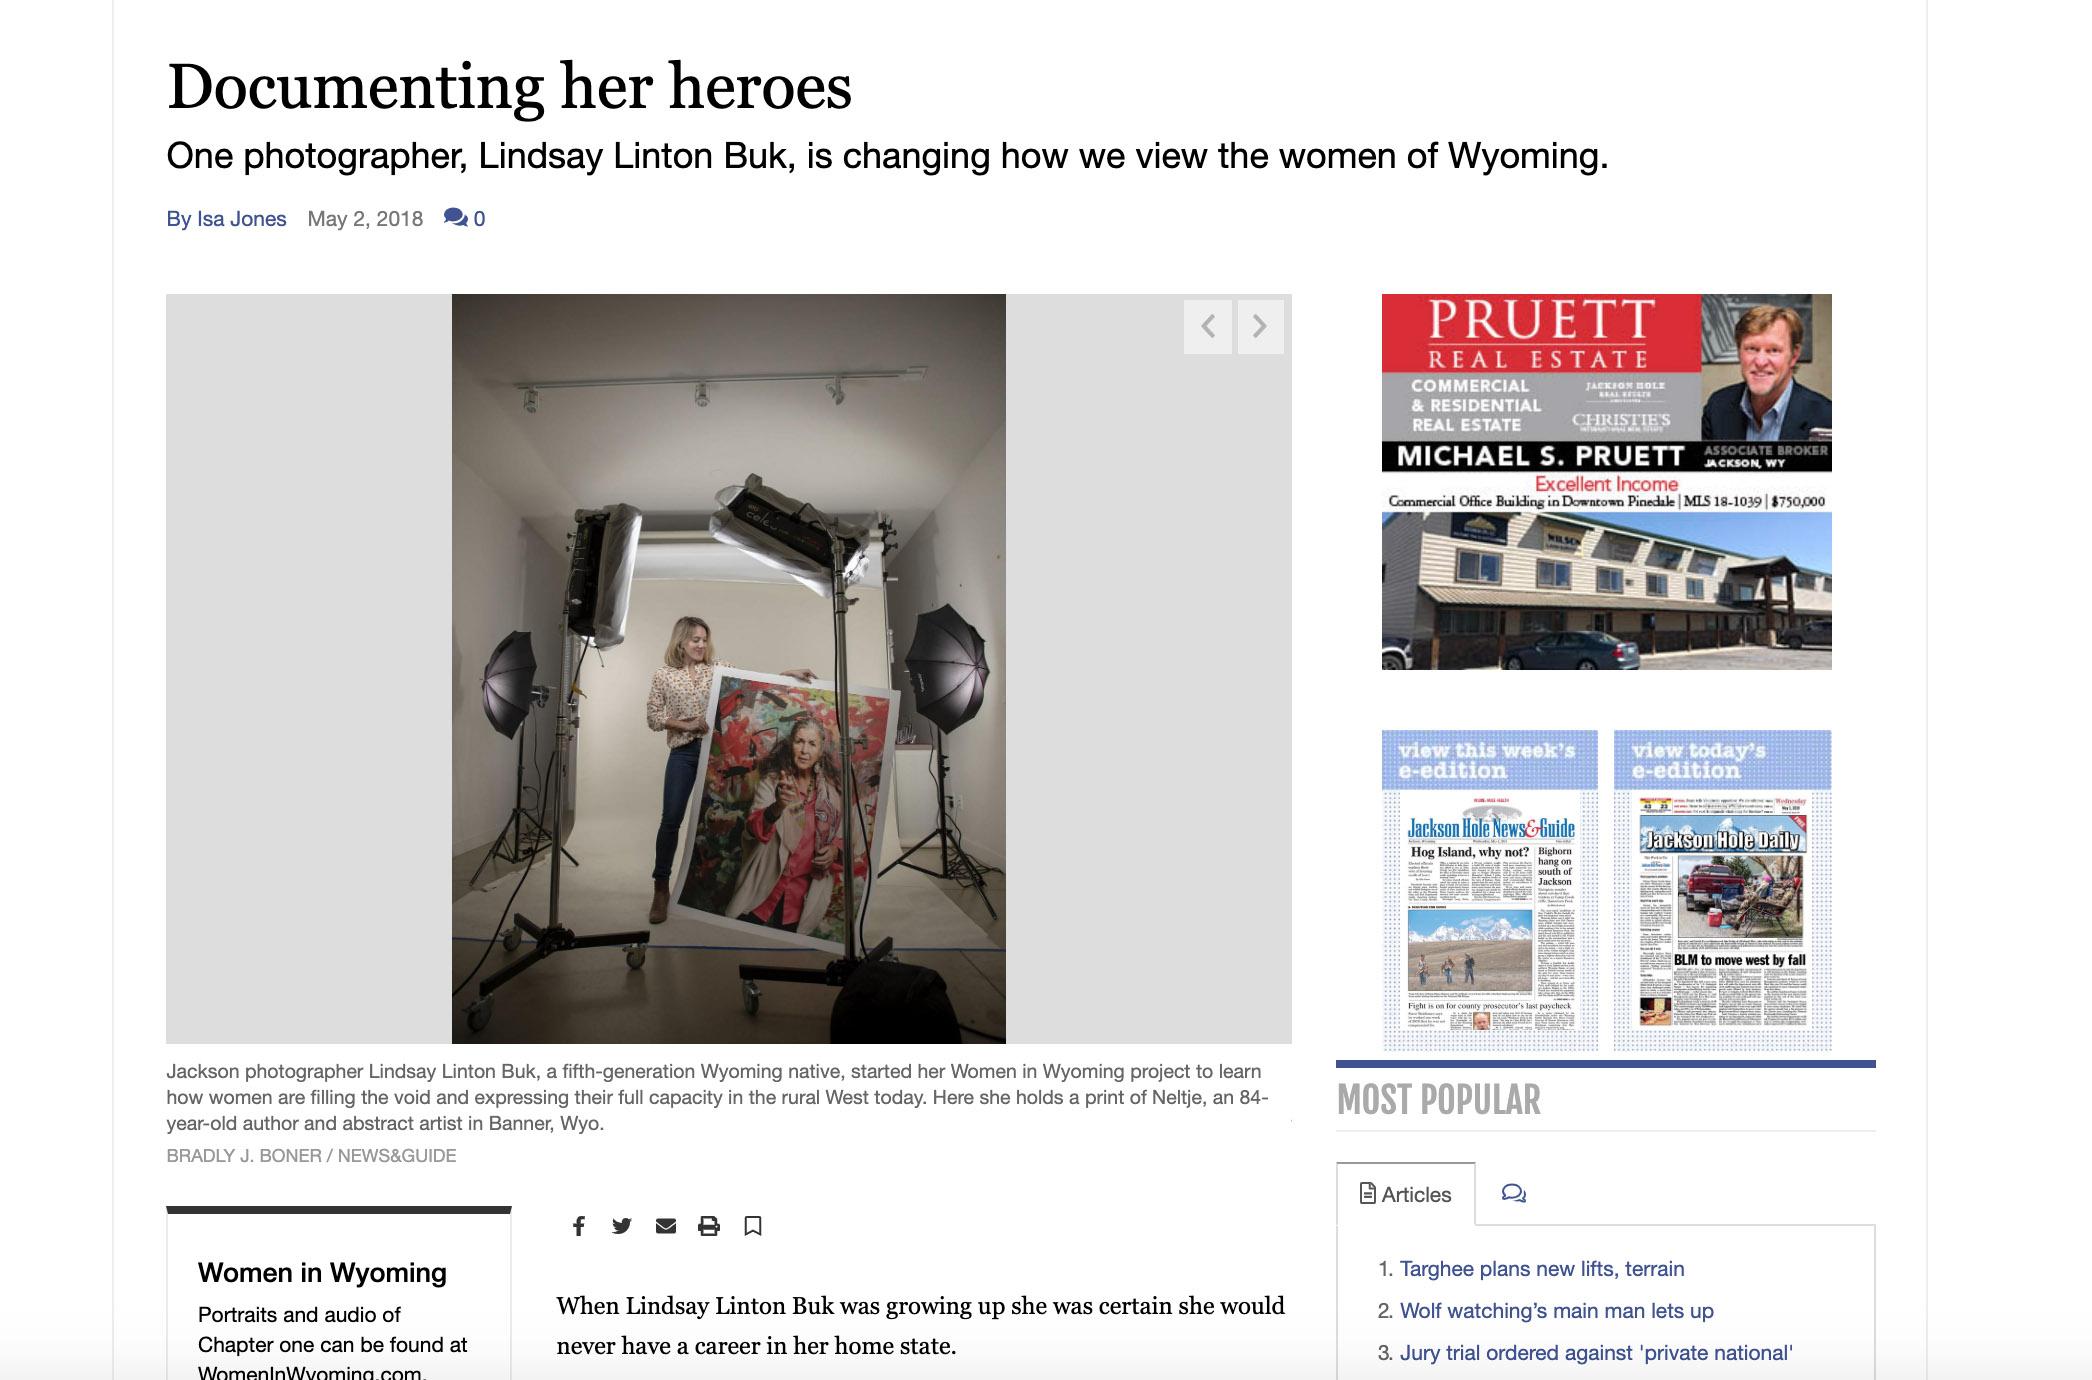 Women_in_Wyoming_Press_JHNG.jpg